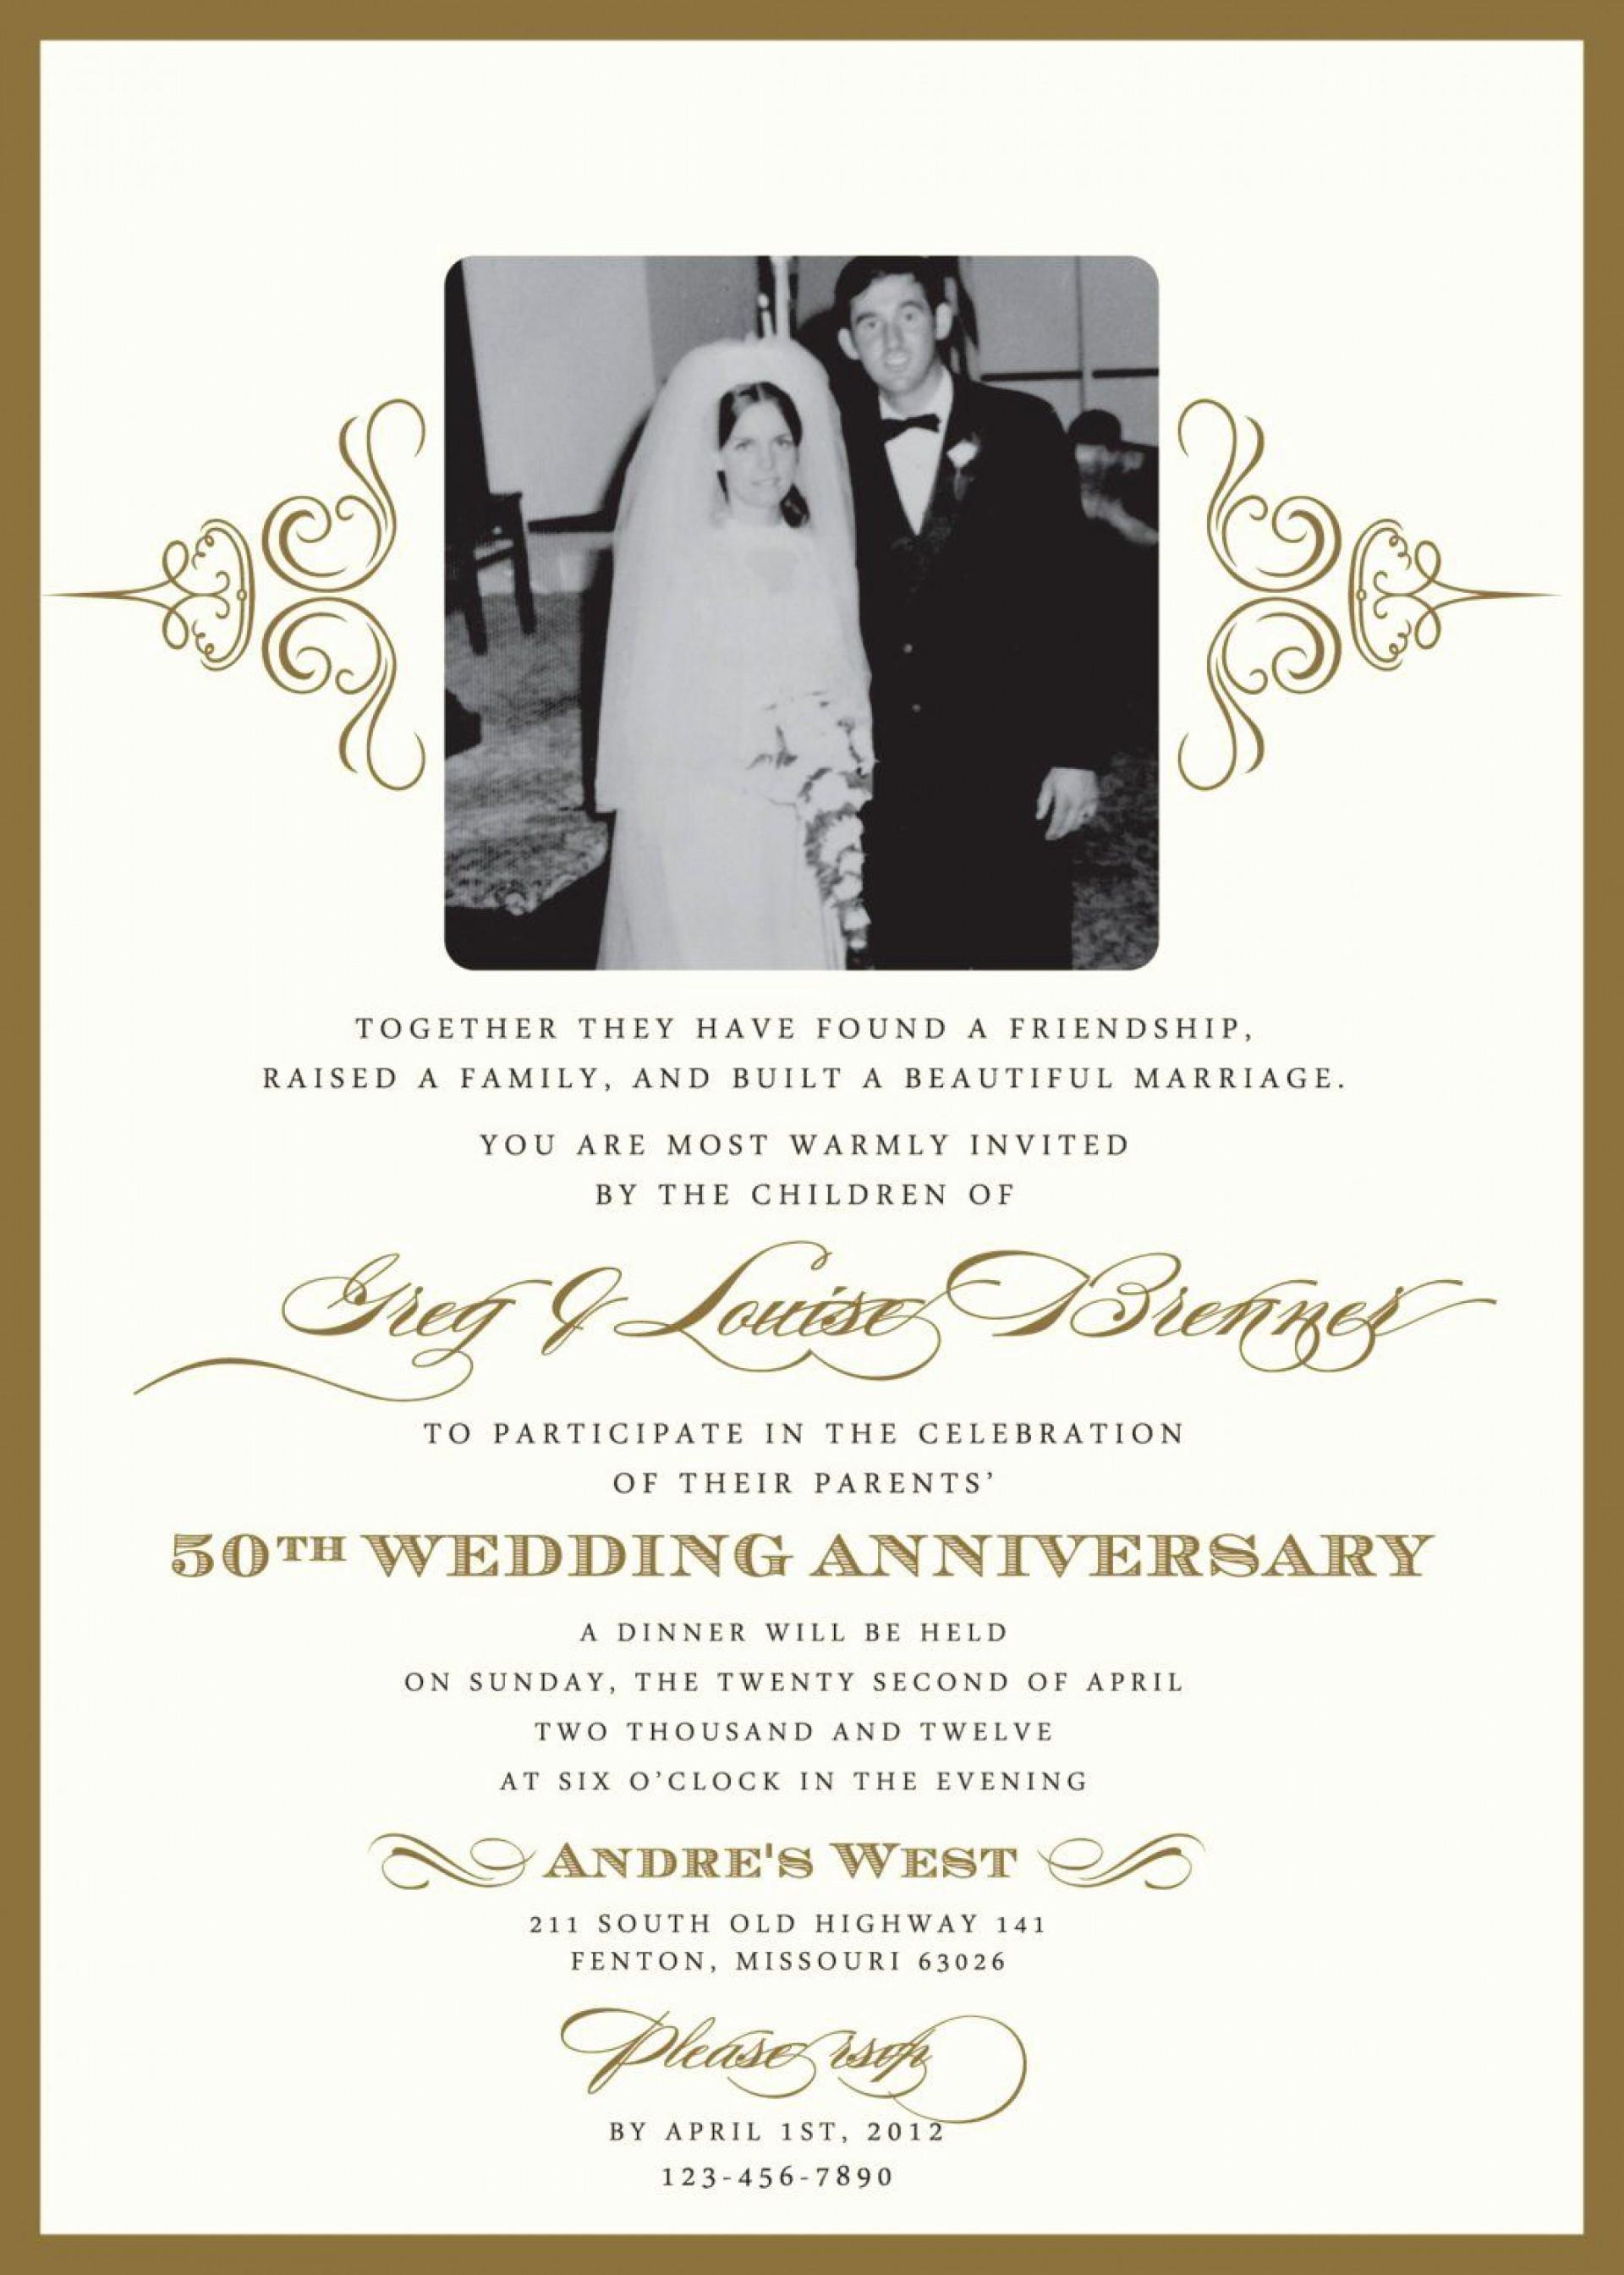 002 Stirring 50th Anniversary Invitation Design High Definition  Designs Wedding Template Microsoft Word Surprise Party Wording Card Idea1920